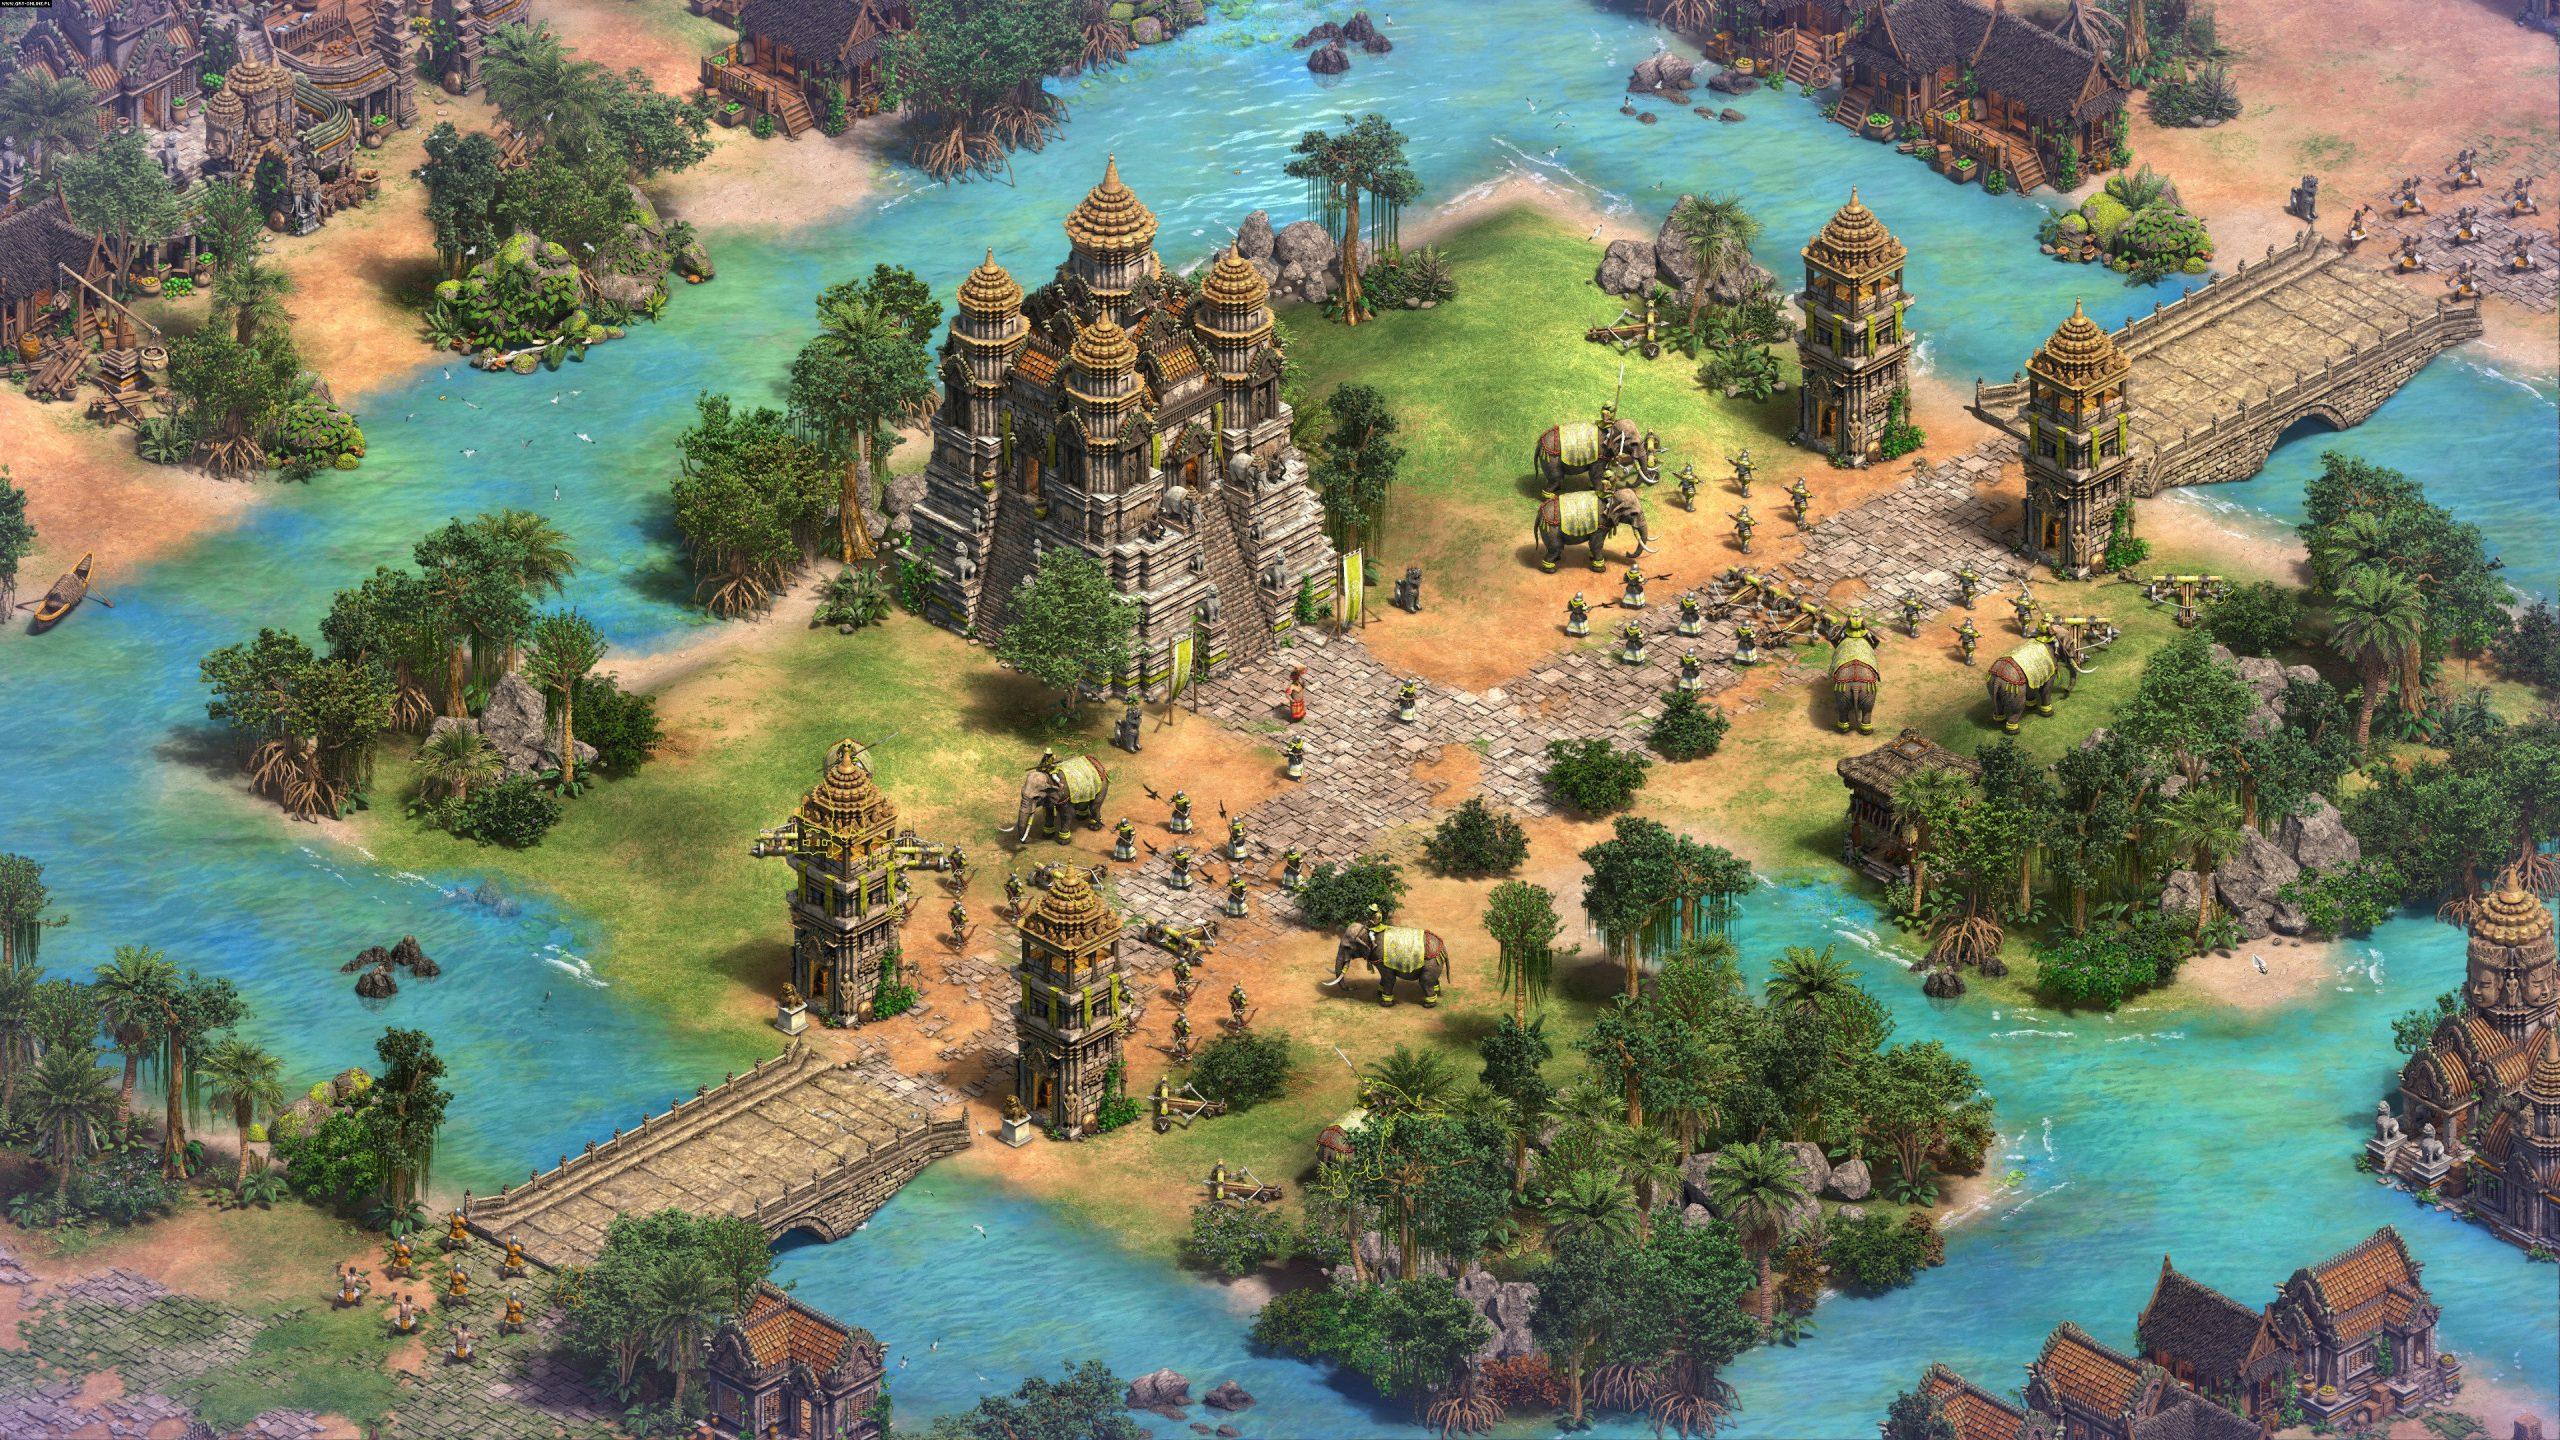 Видео, Стратегии, видео (киберспорт), Age of Empires 2: Definitive Edition, Tropico 6, Anno 1800, Блоги